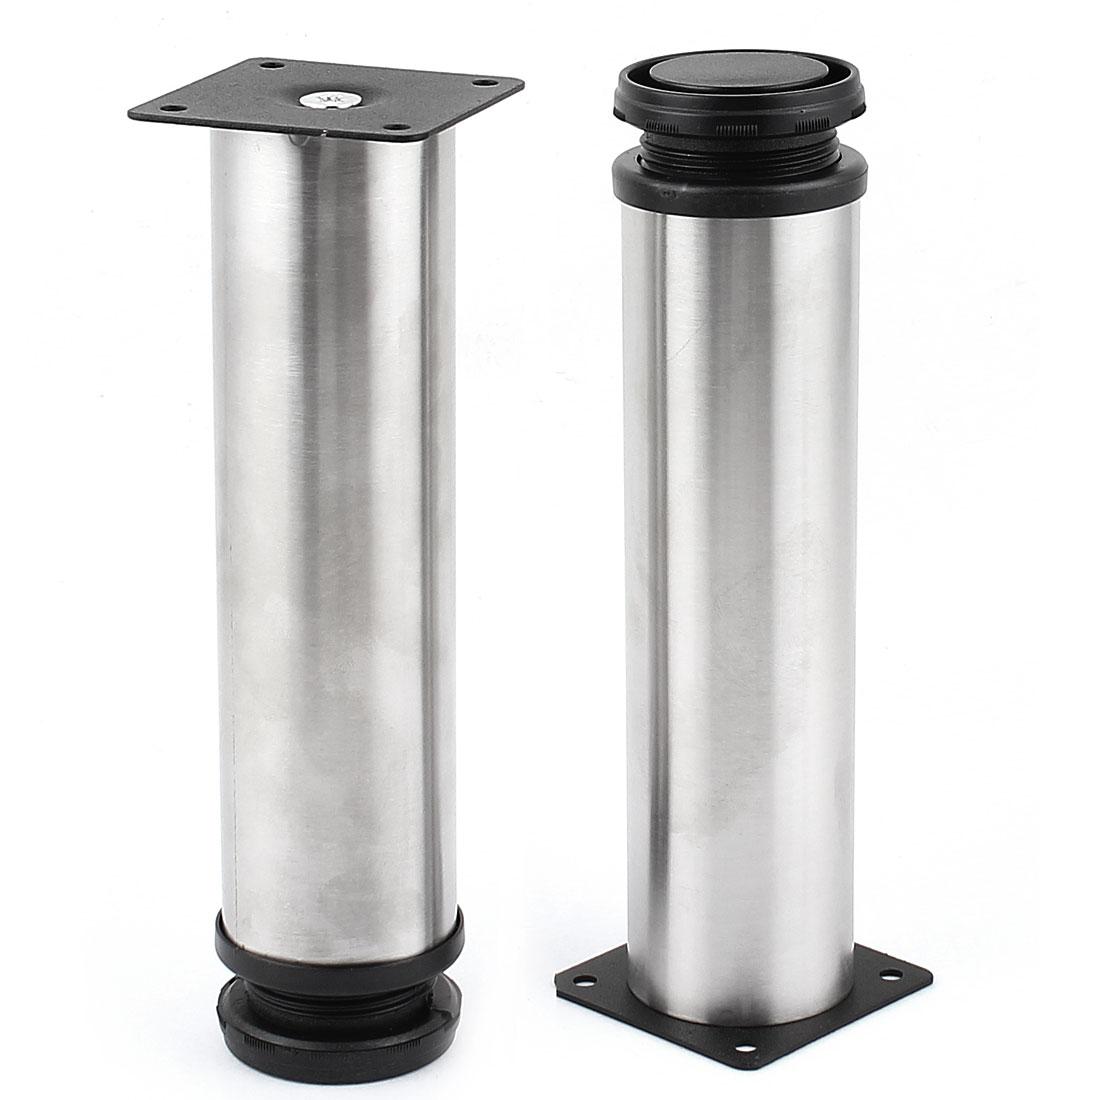 Stainless Steel Kitchen Sofa Table Round Adjustable Cabinet Leg 2pcs